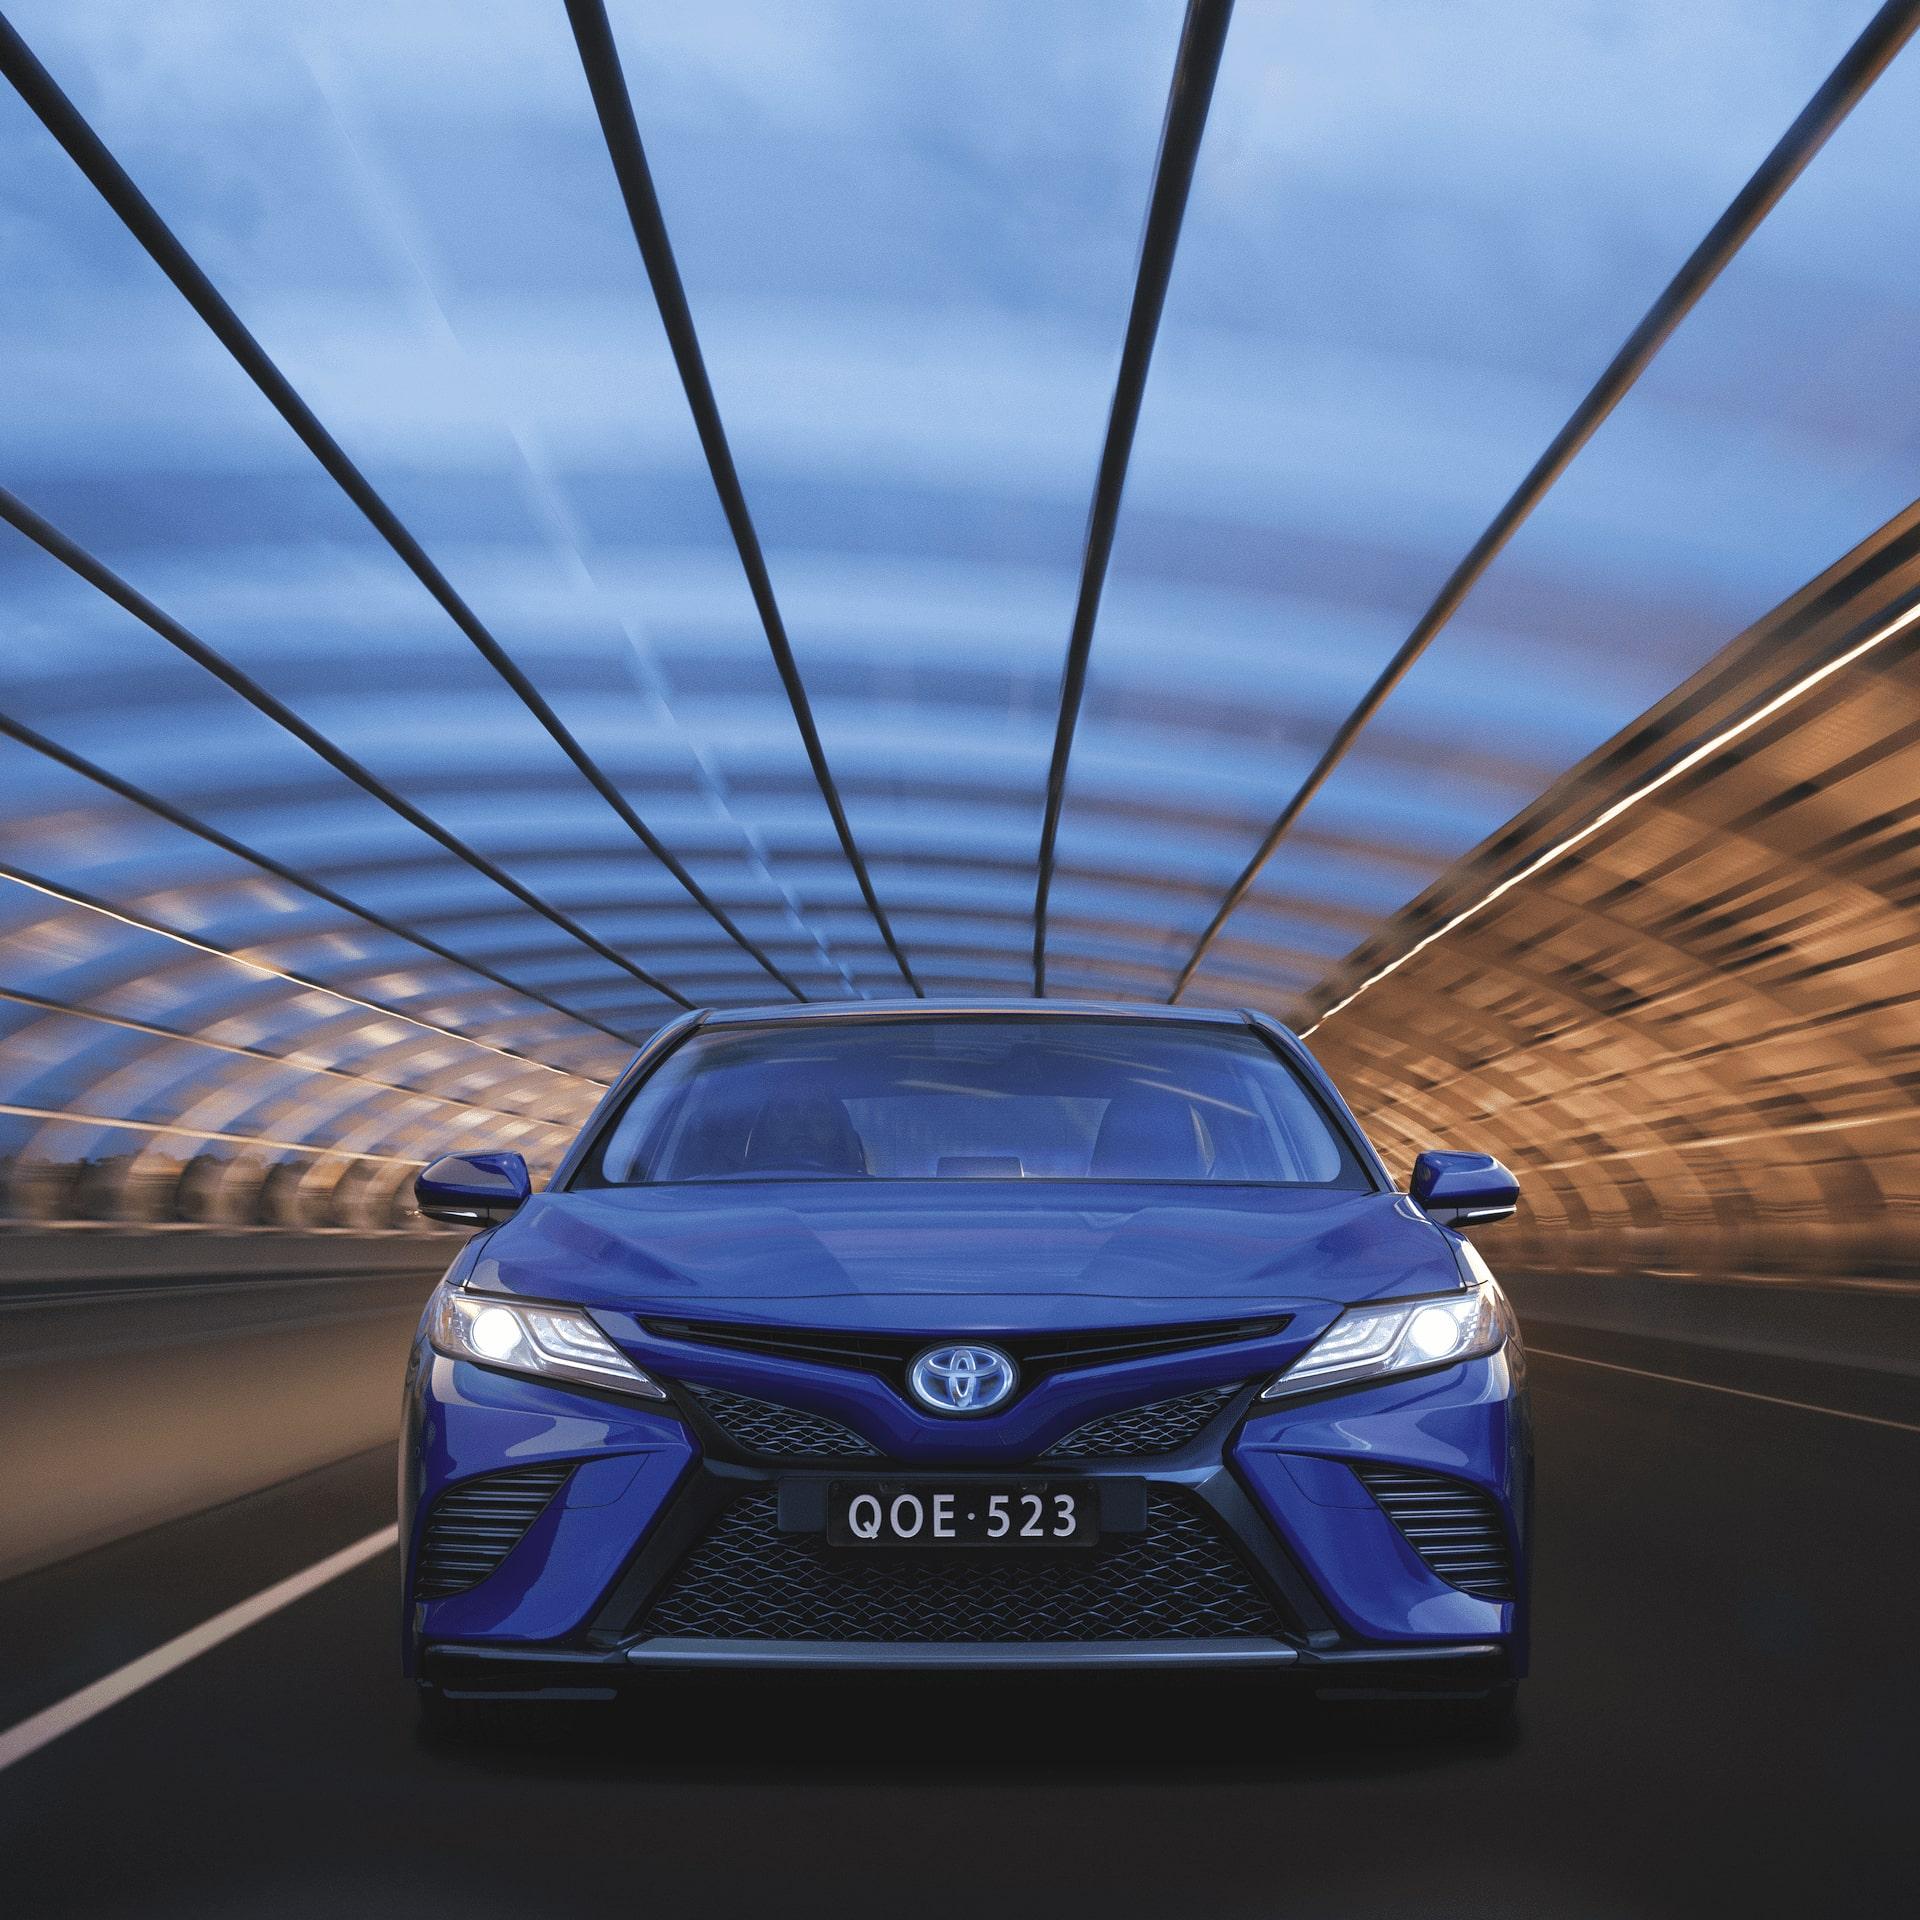 Buy second hand cars online australia